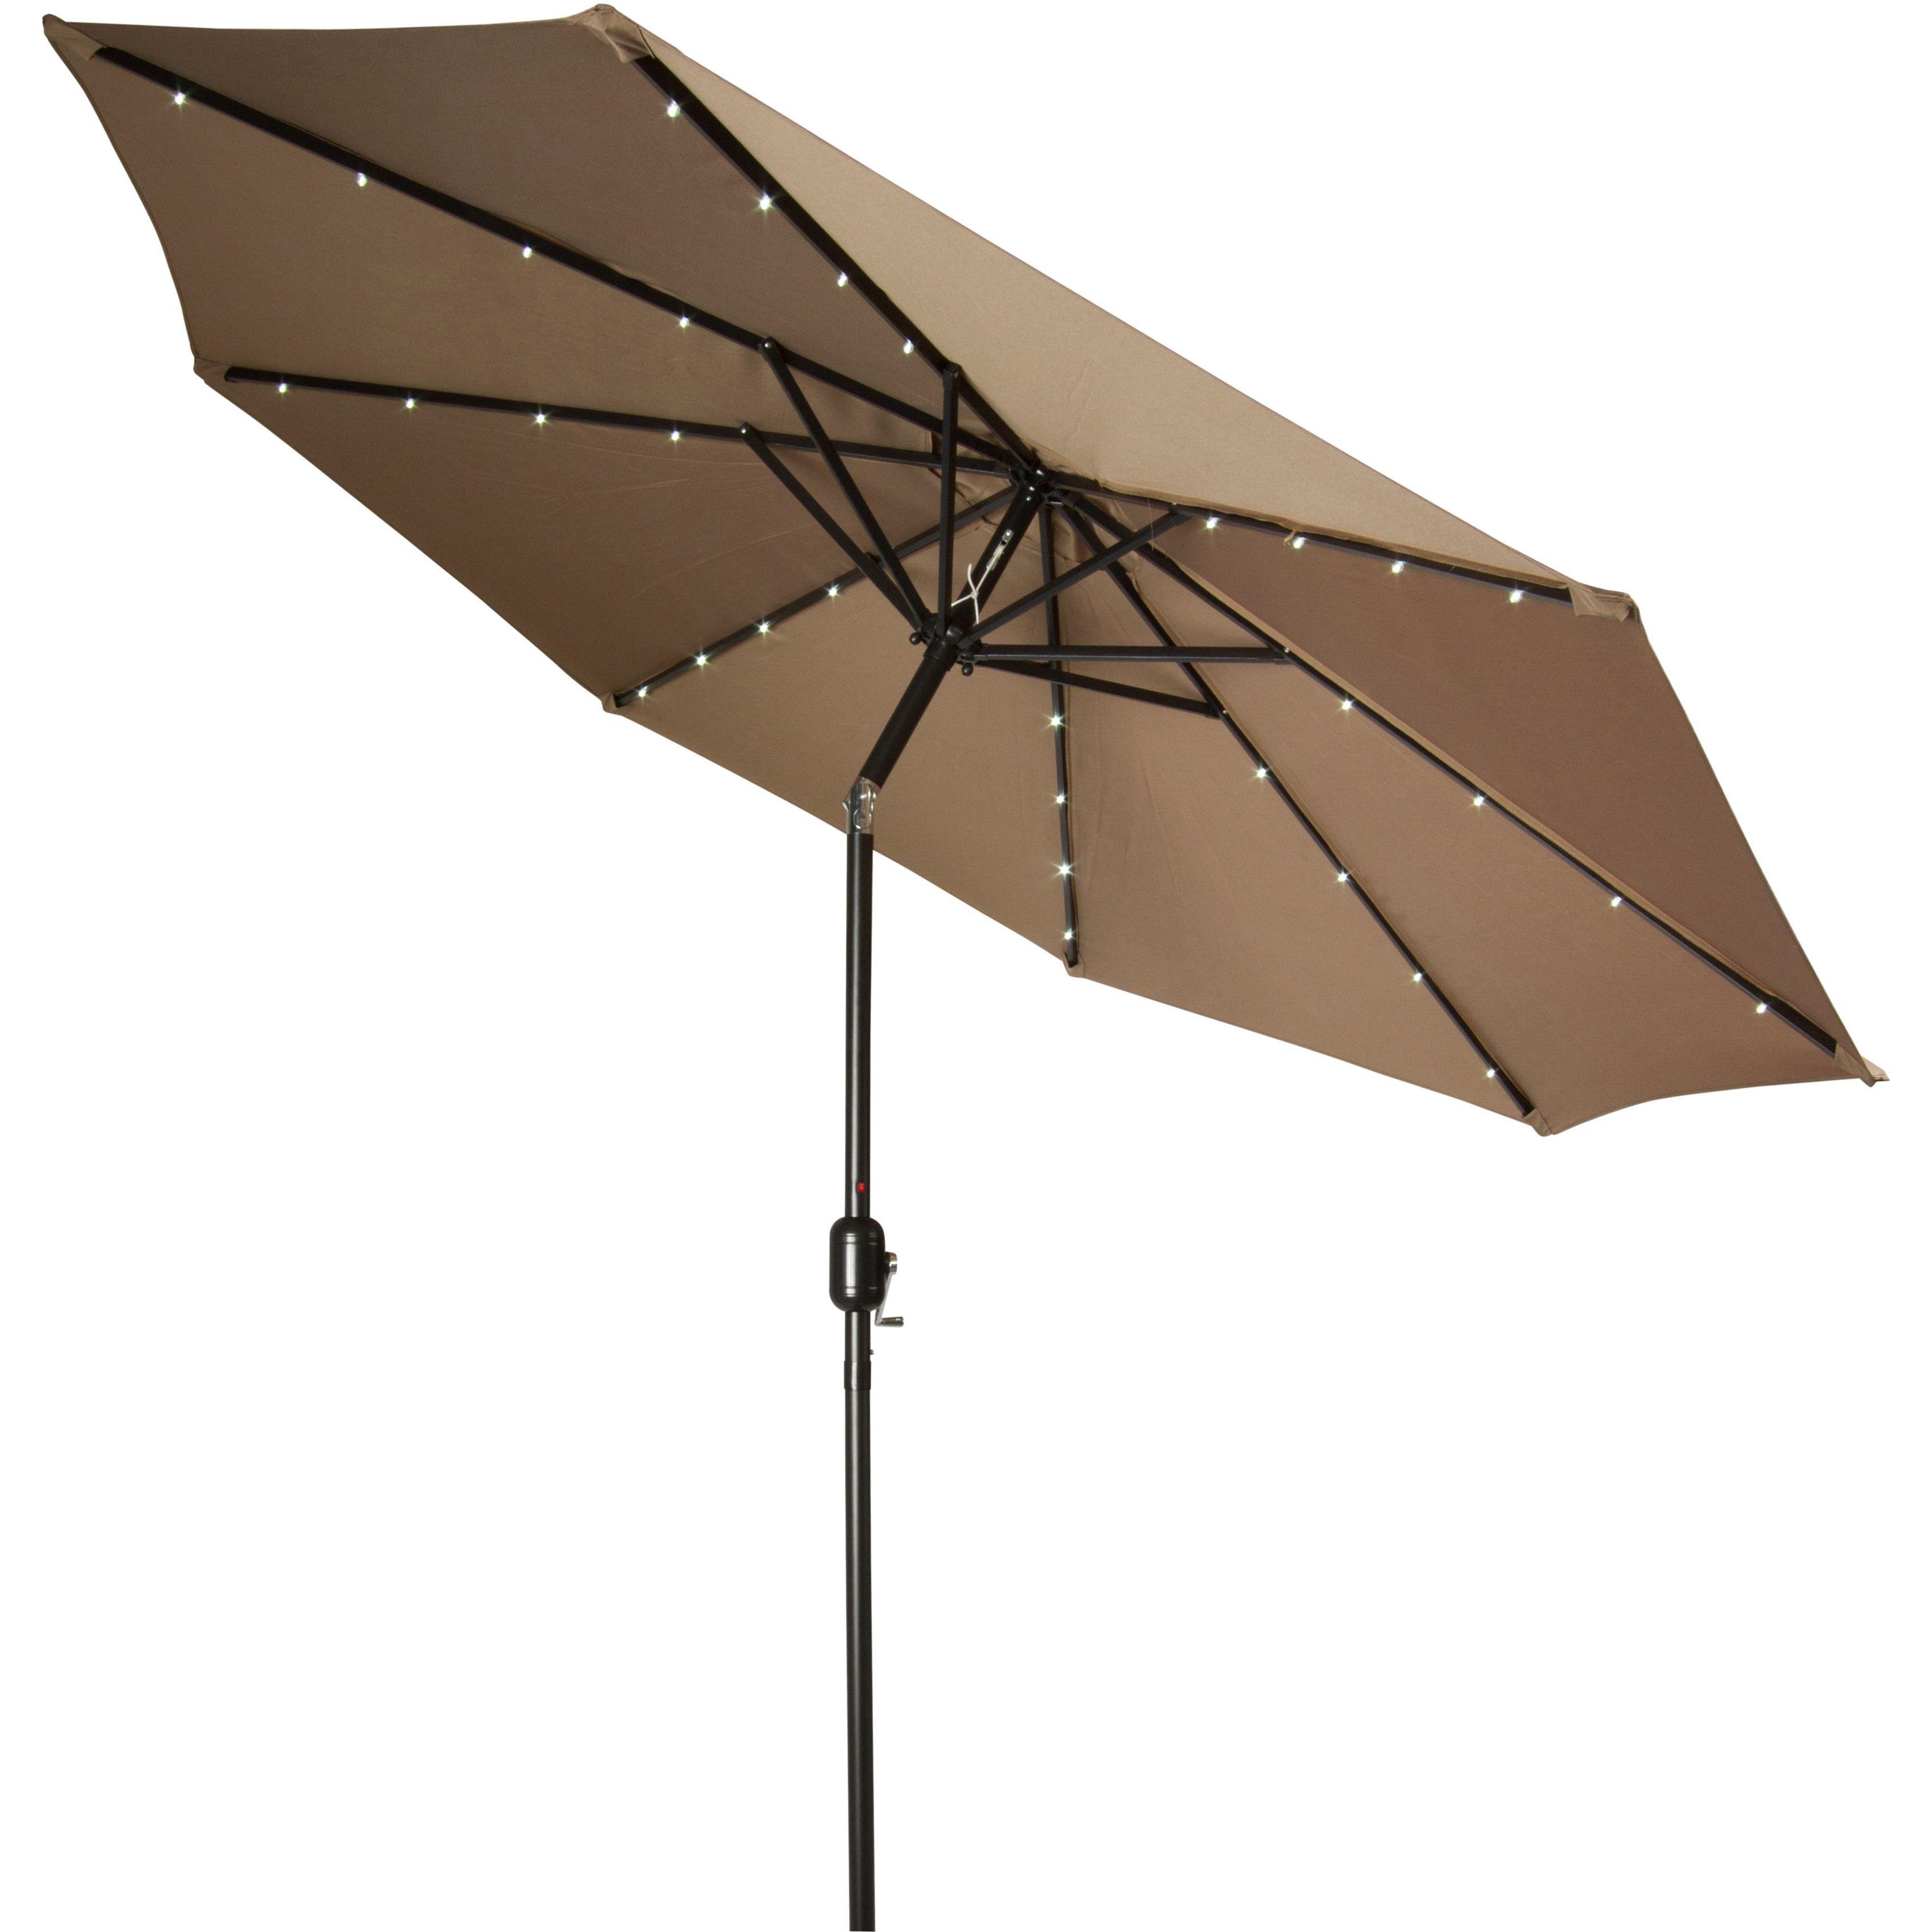 lights mojmalnews review patio atlas homemade outdoor lighting ideas umbrella all download outdoors